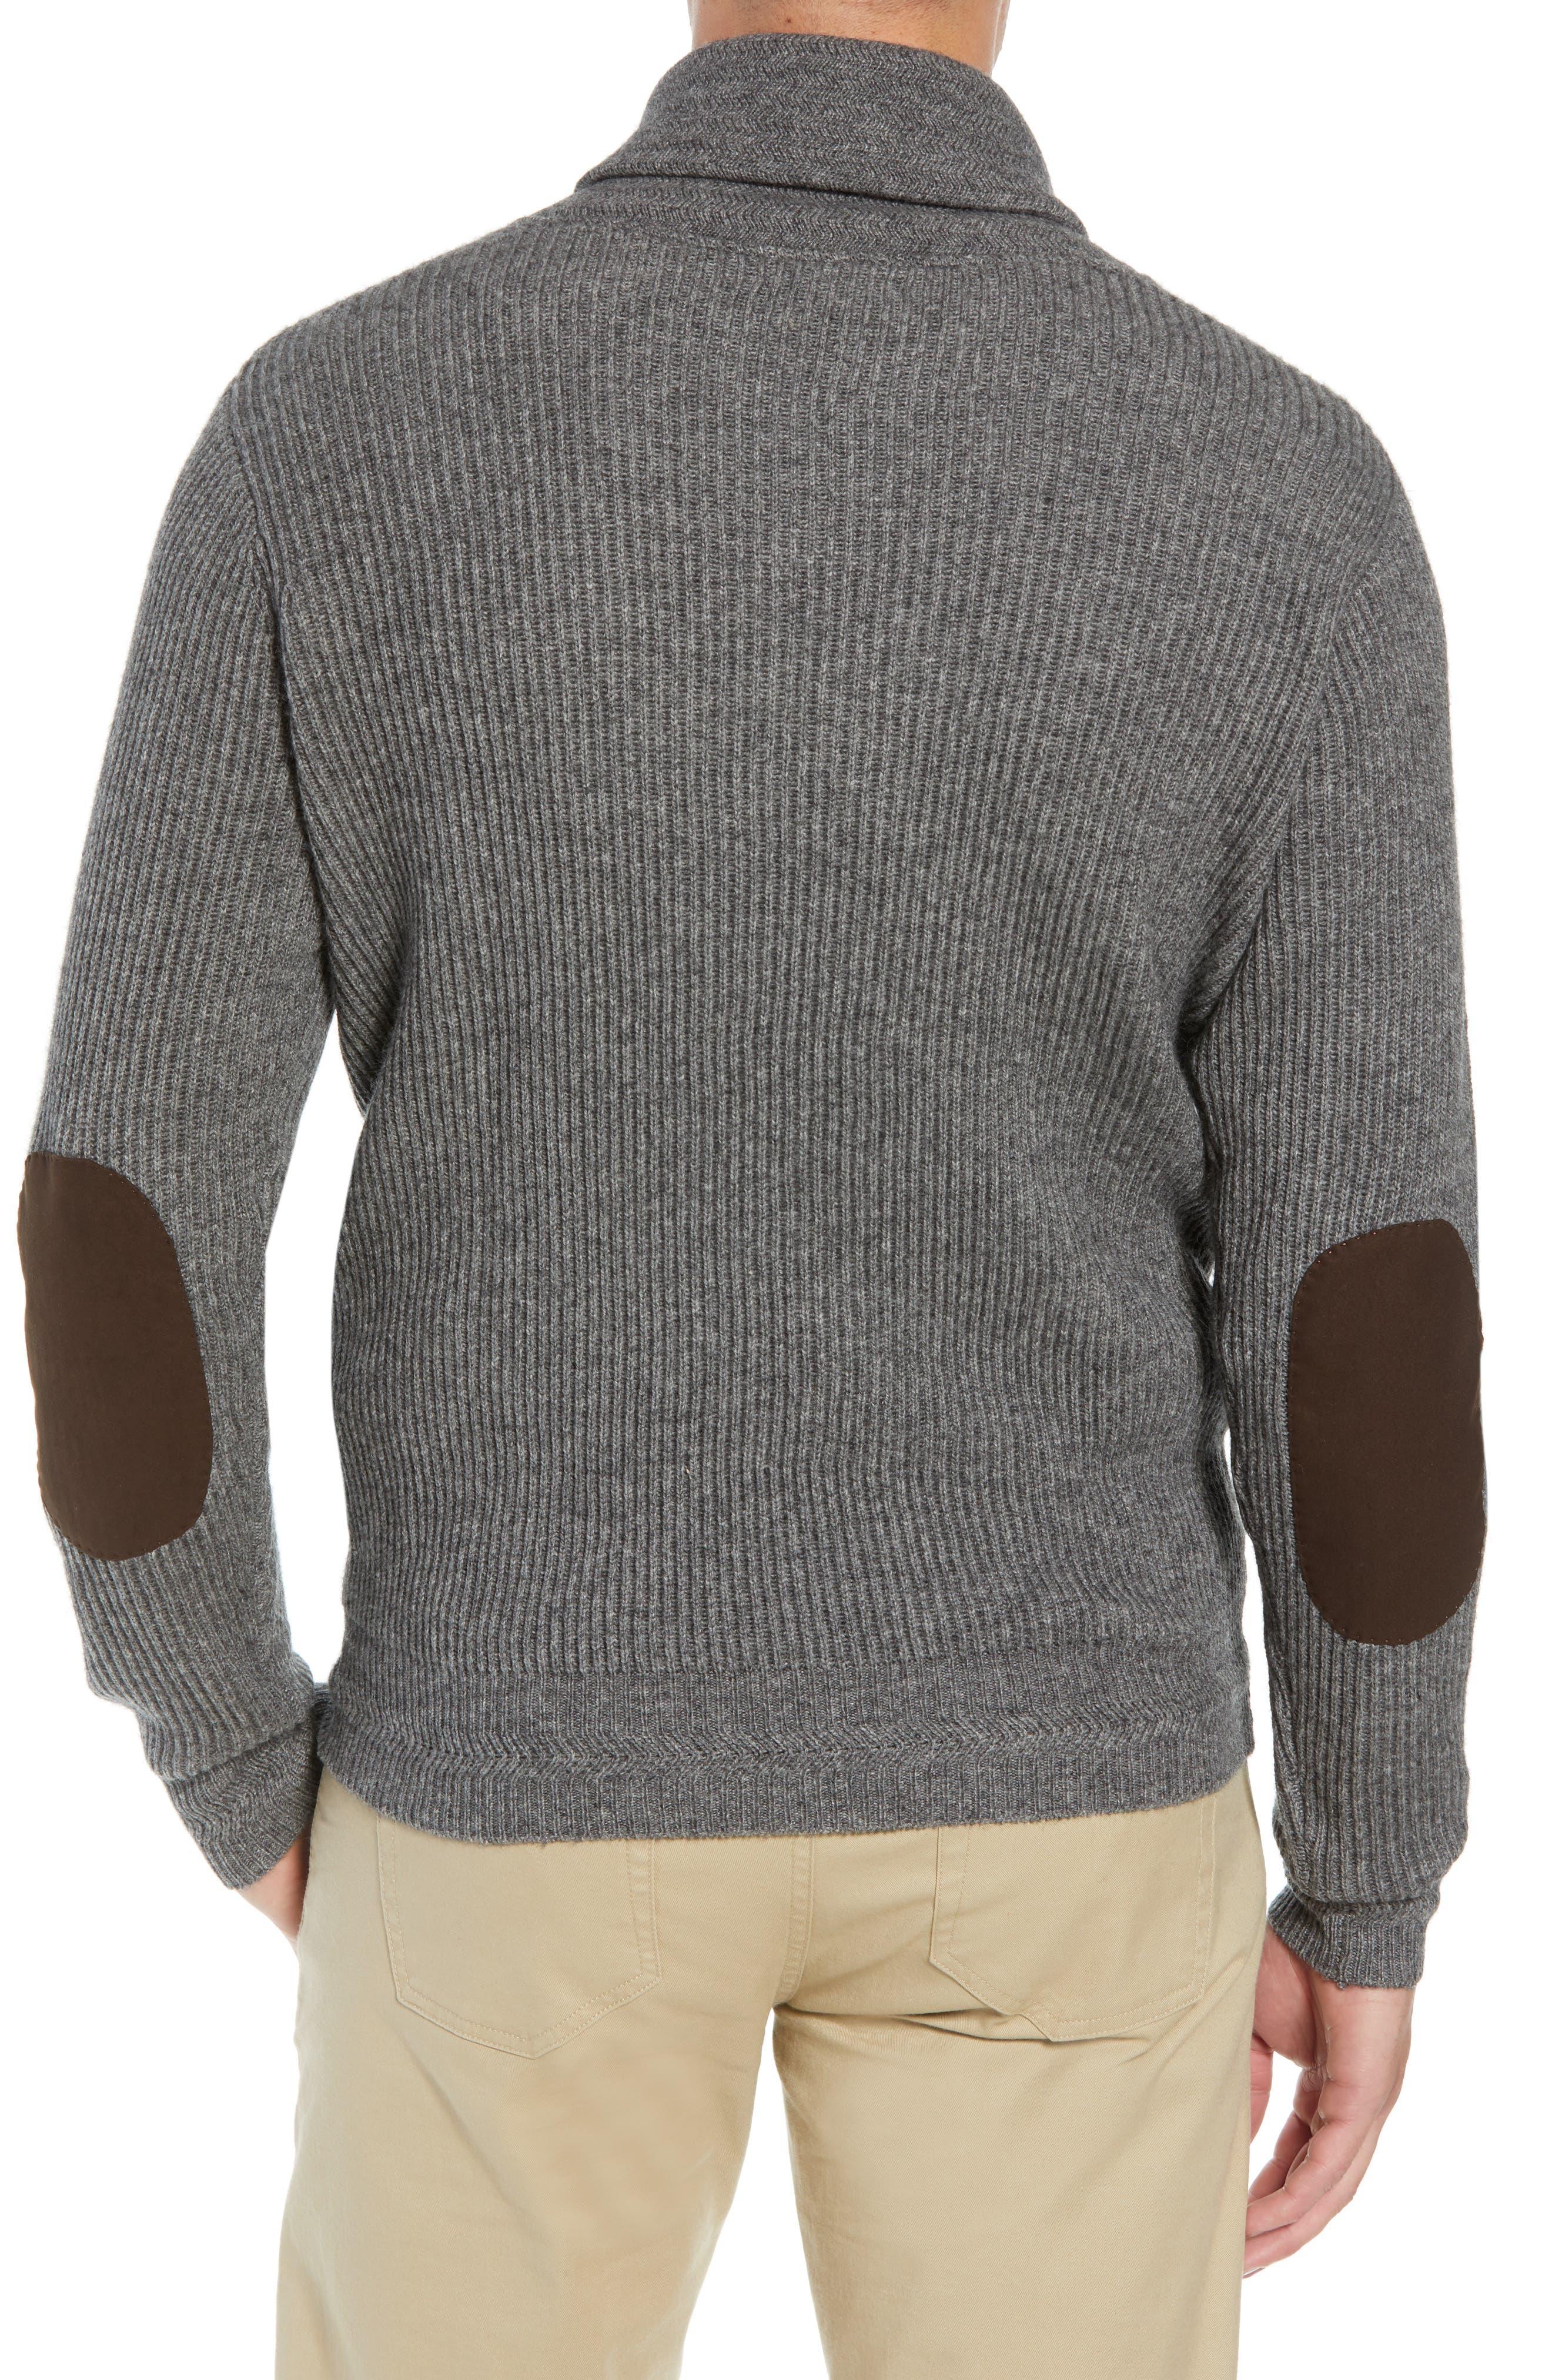 Mountainside Wool Blend Shawl Sweater,                             Alternate thumbnail 2, color,                             GREY